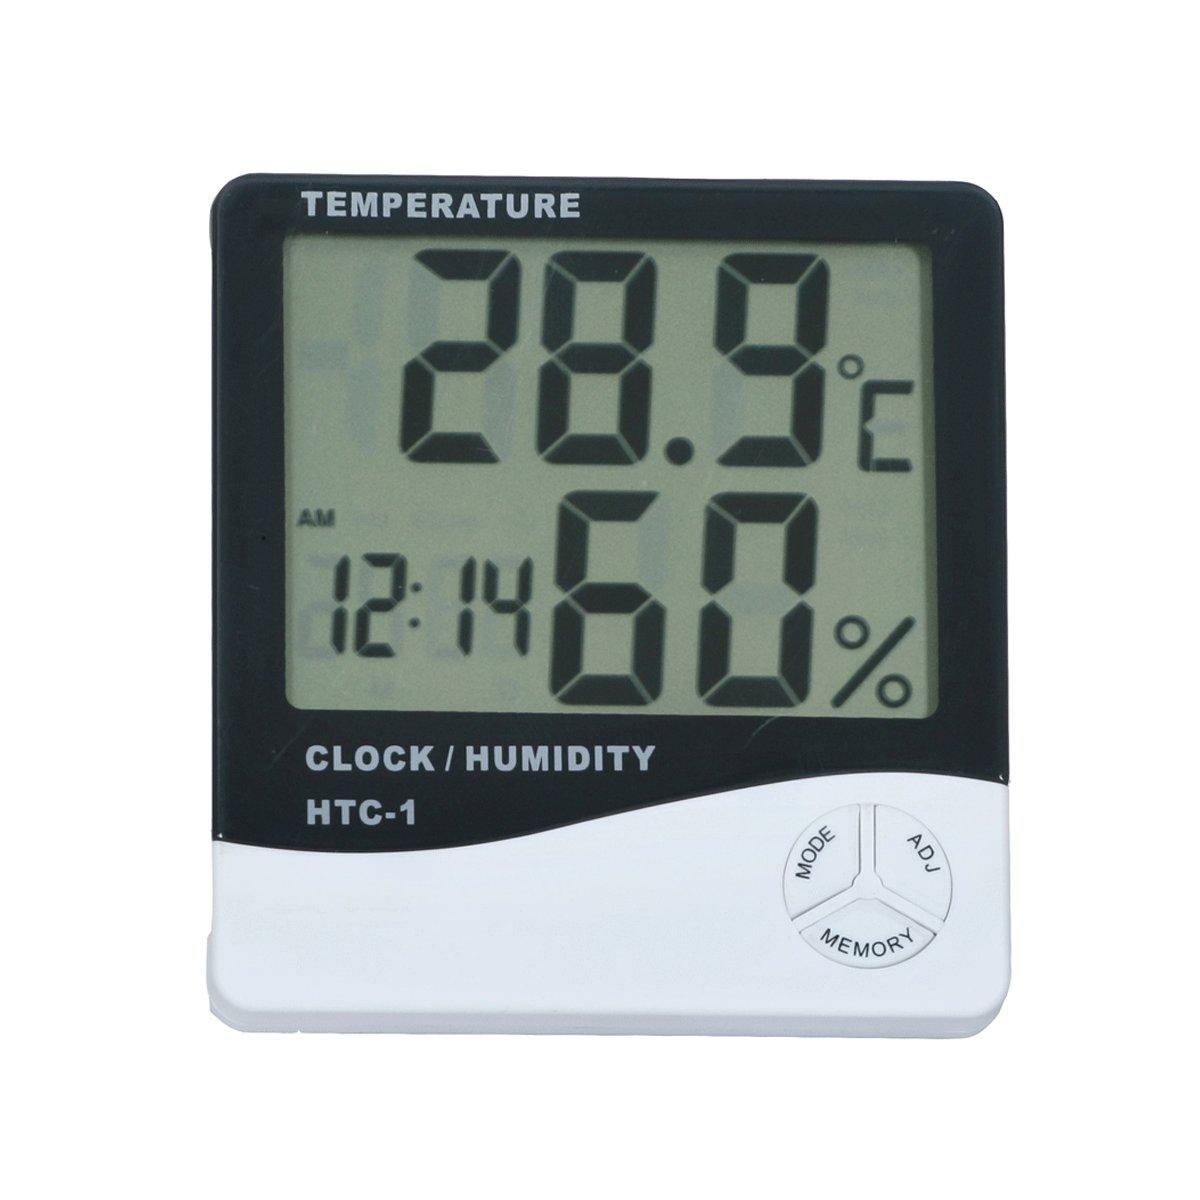 Smarstar LCD Digital Temp/érature M/ètre dhumidit/é Horloge Thermom/ètre Hygrom/ètre 0C /à 50C